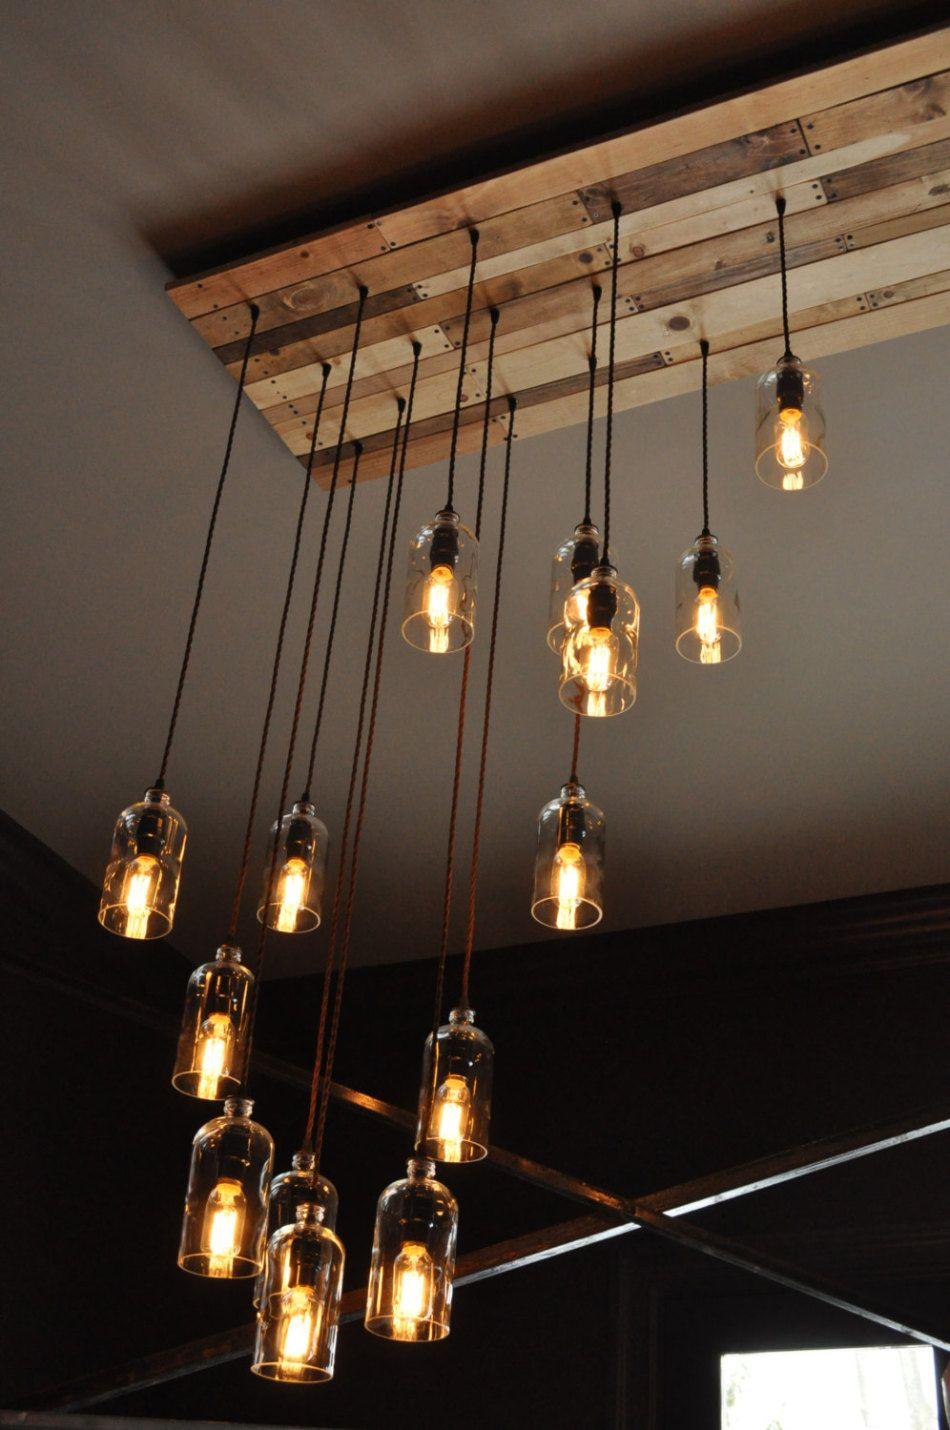 Lampadari, appliques e lampade in stile industriale creati